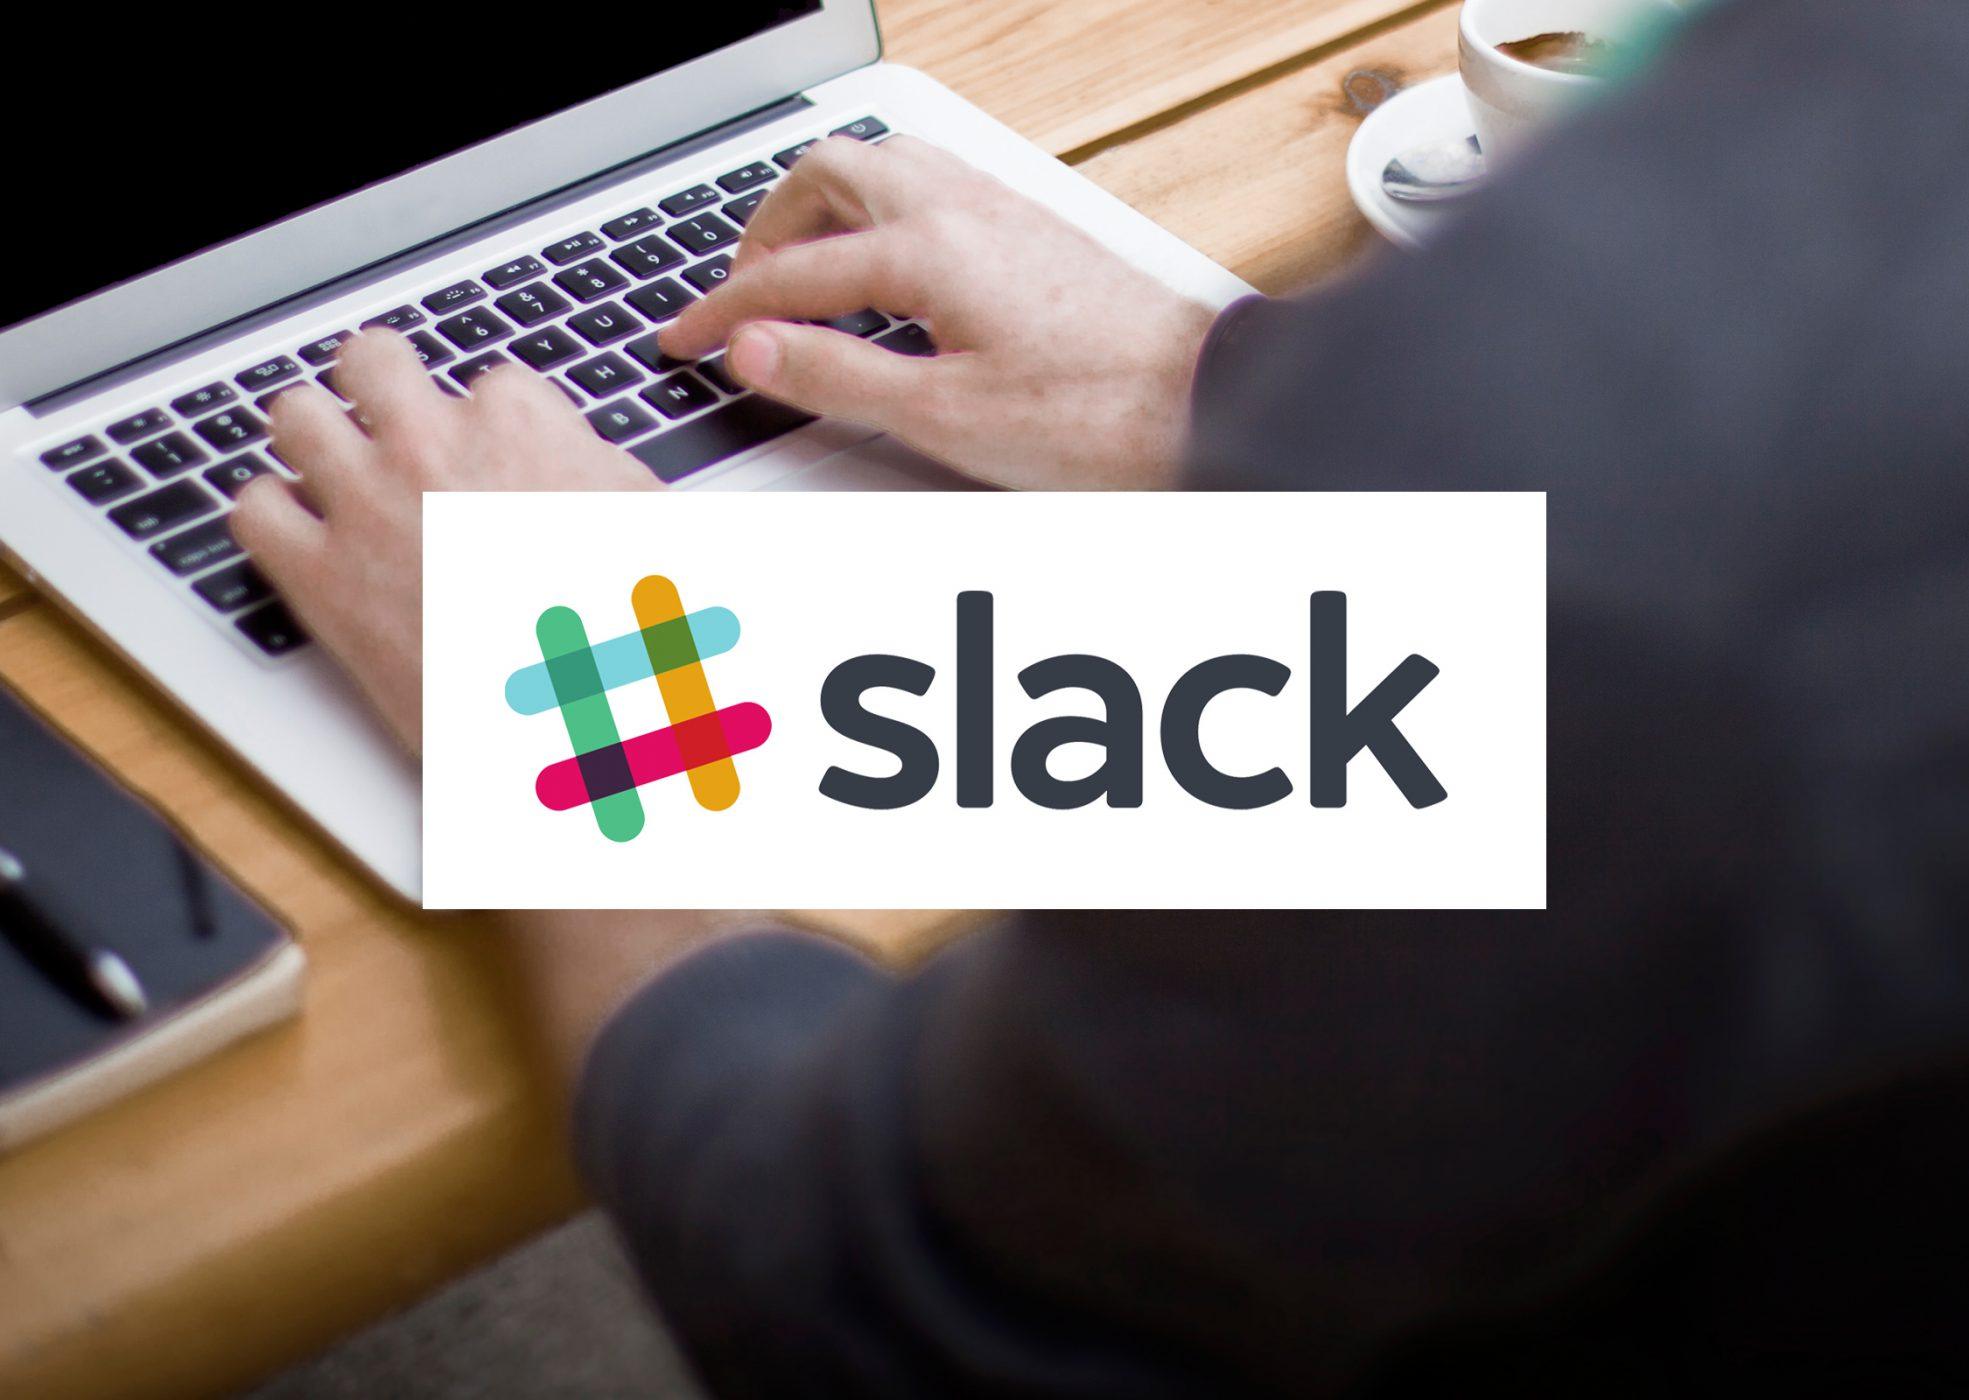 slack-logo-laptop